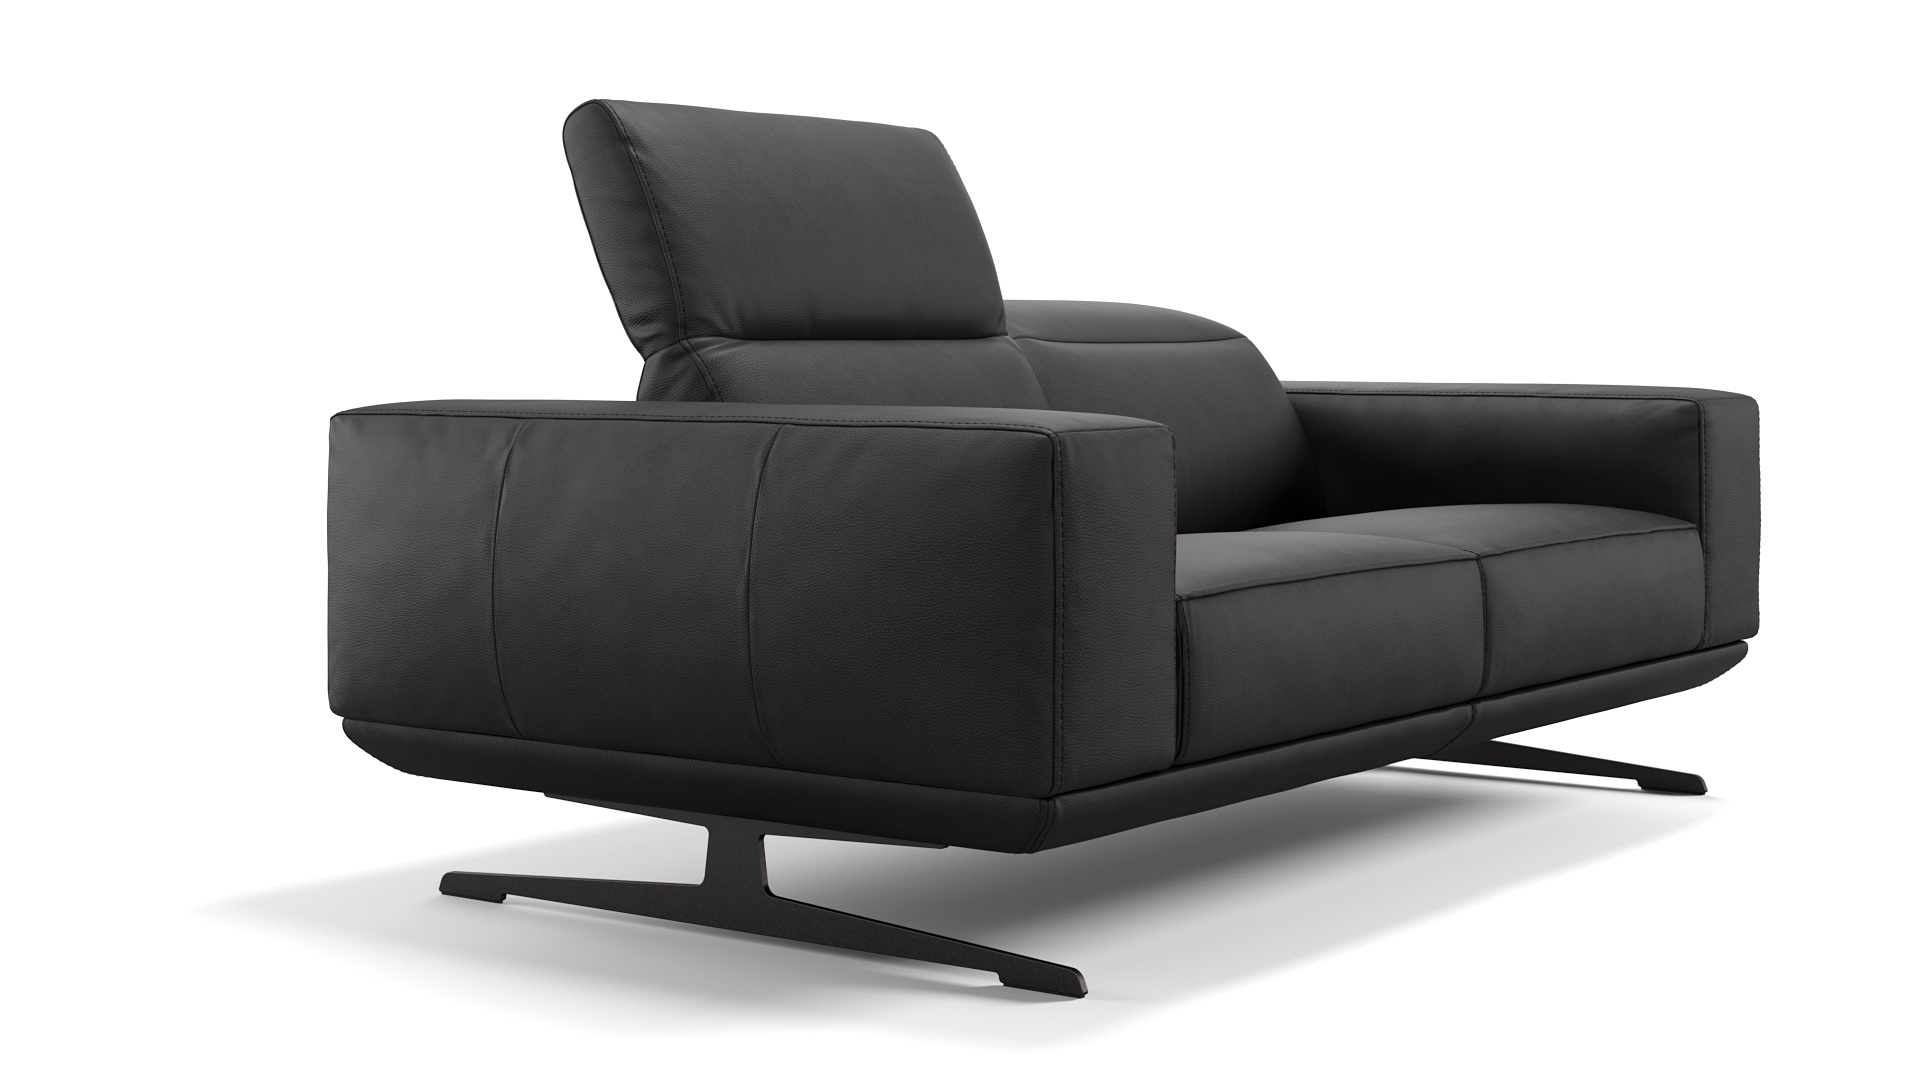 Leder 2-Sitzer Sofa MERANO